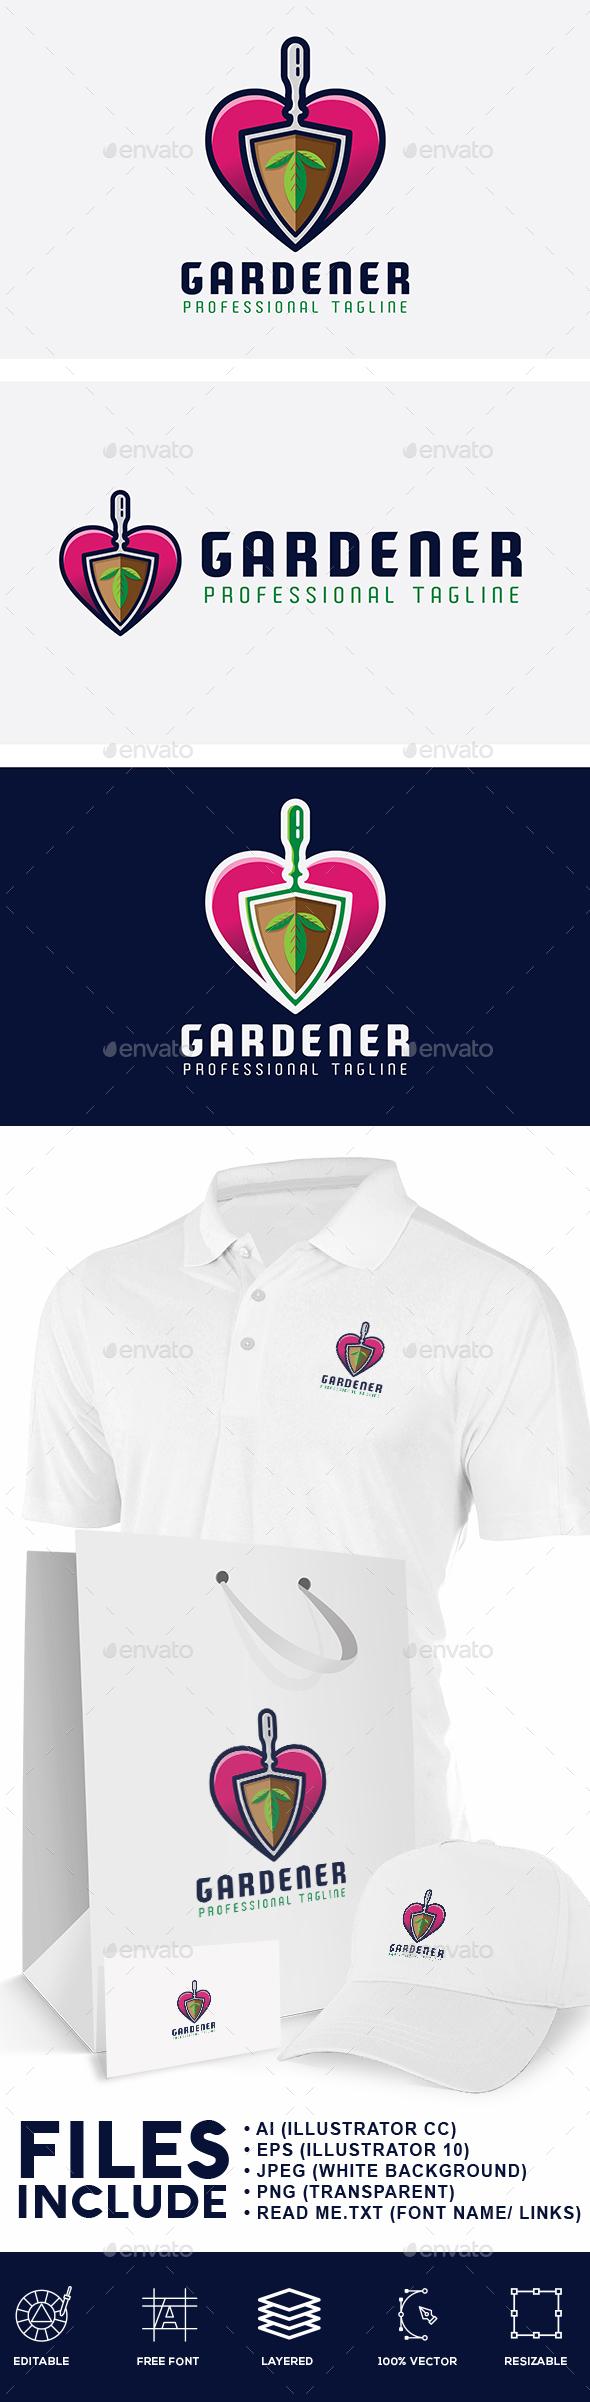 Gardener Logo - Nature Logo Templates